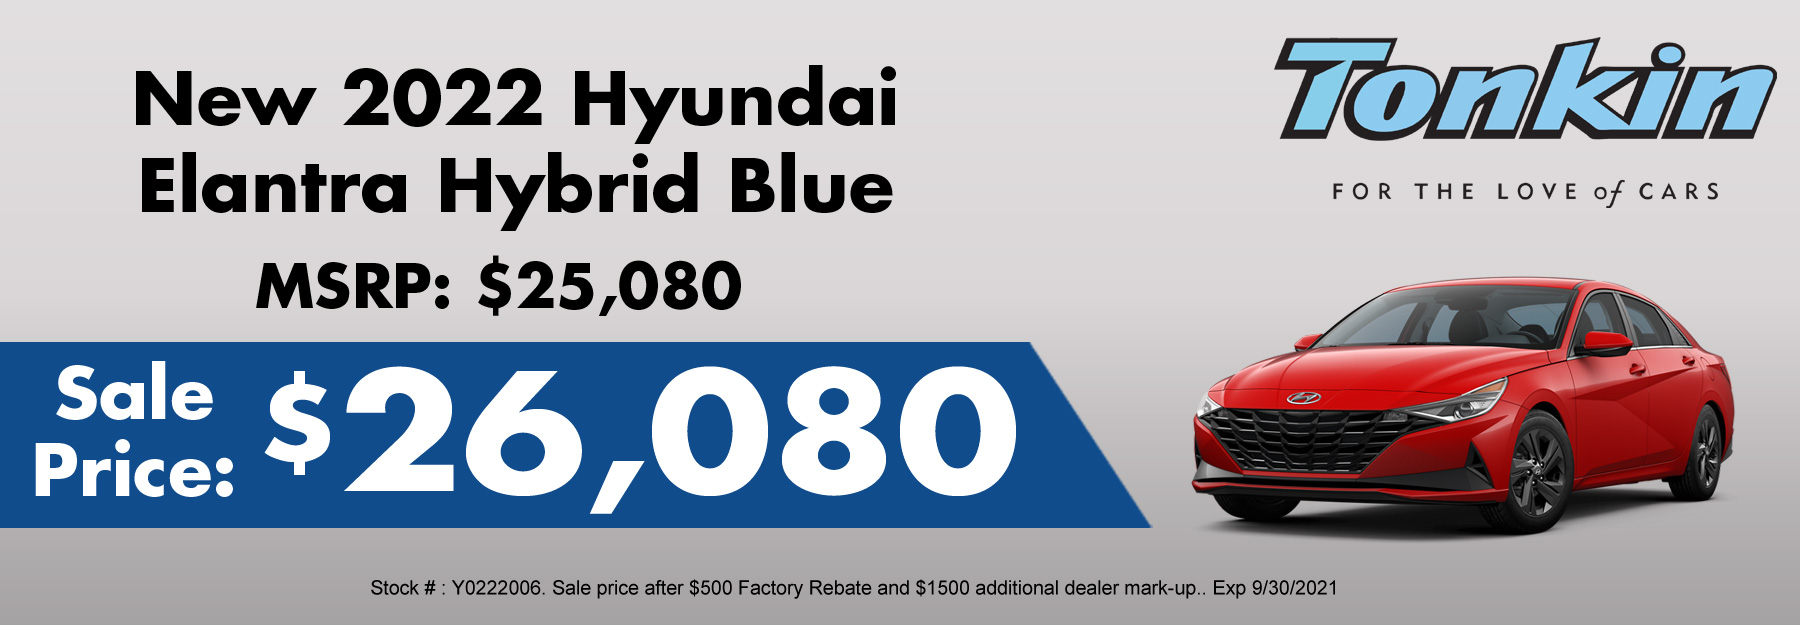 Ron Tonkin Hyundai >> Ron Tonkin Hyundai New Hyundai Dealership In Gresham Or